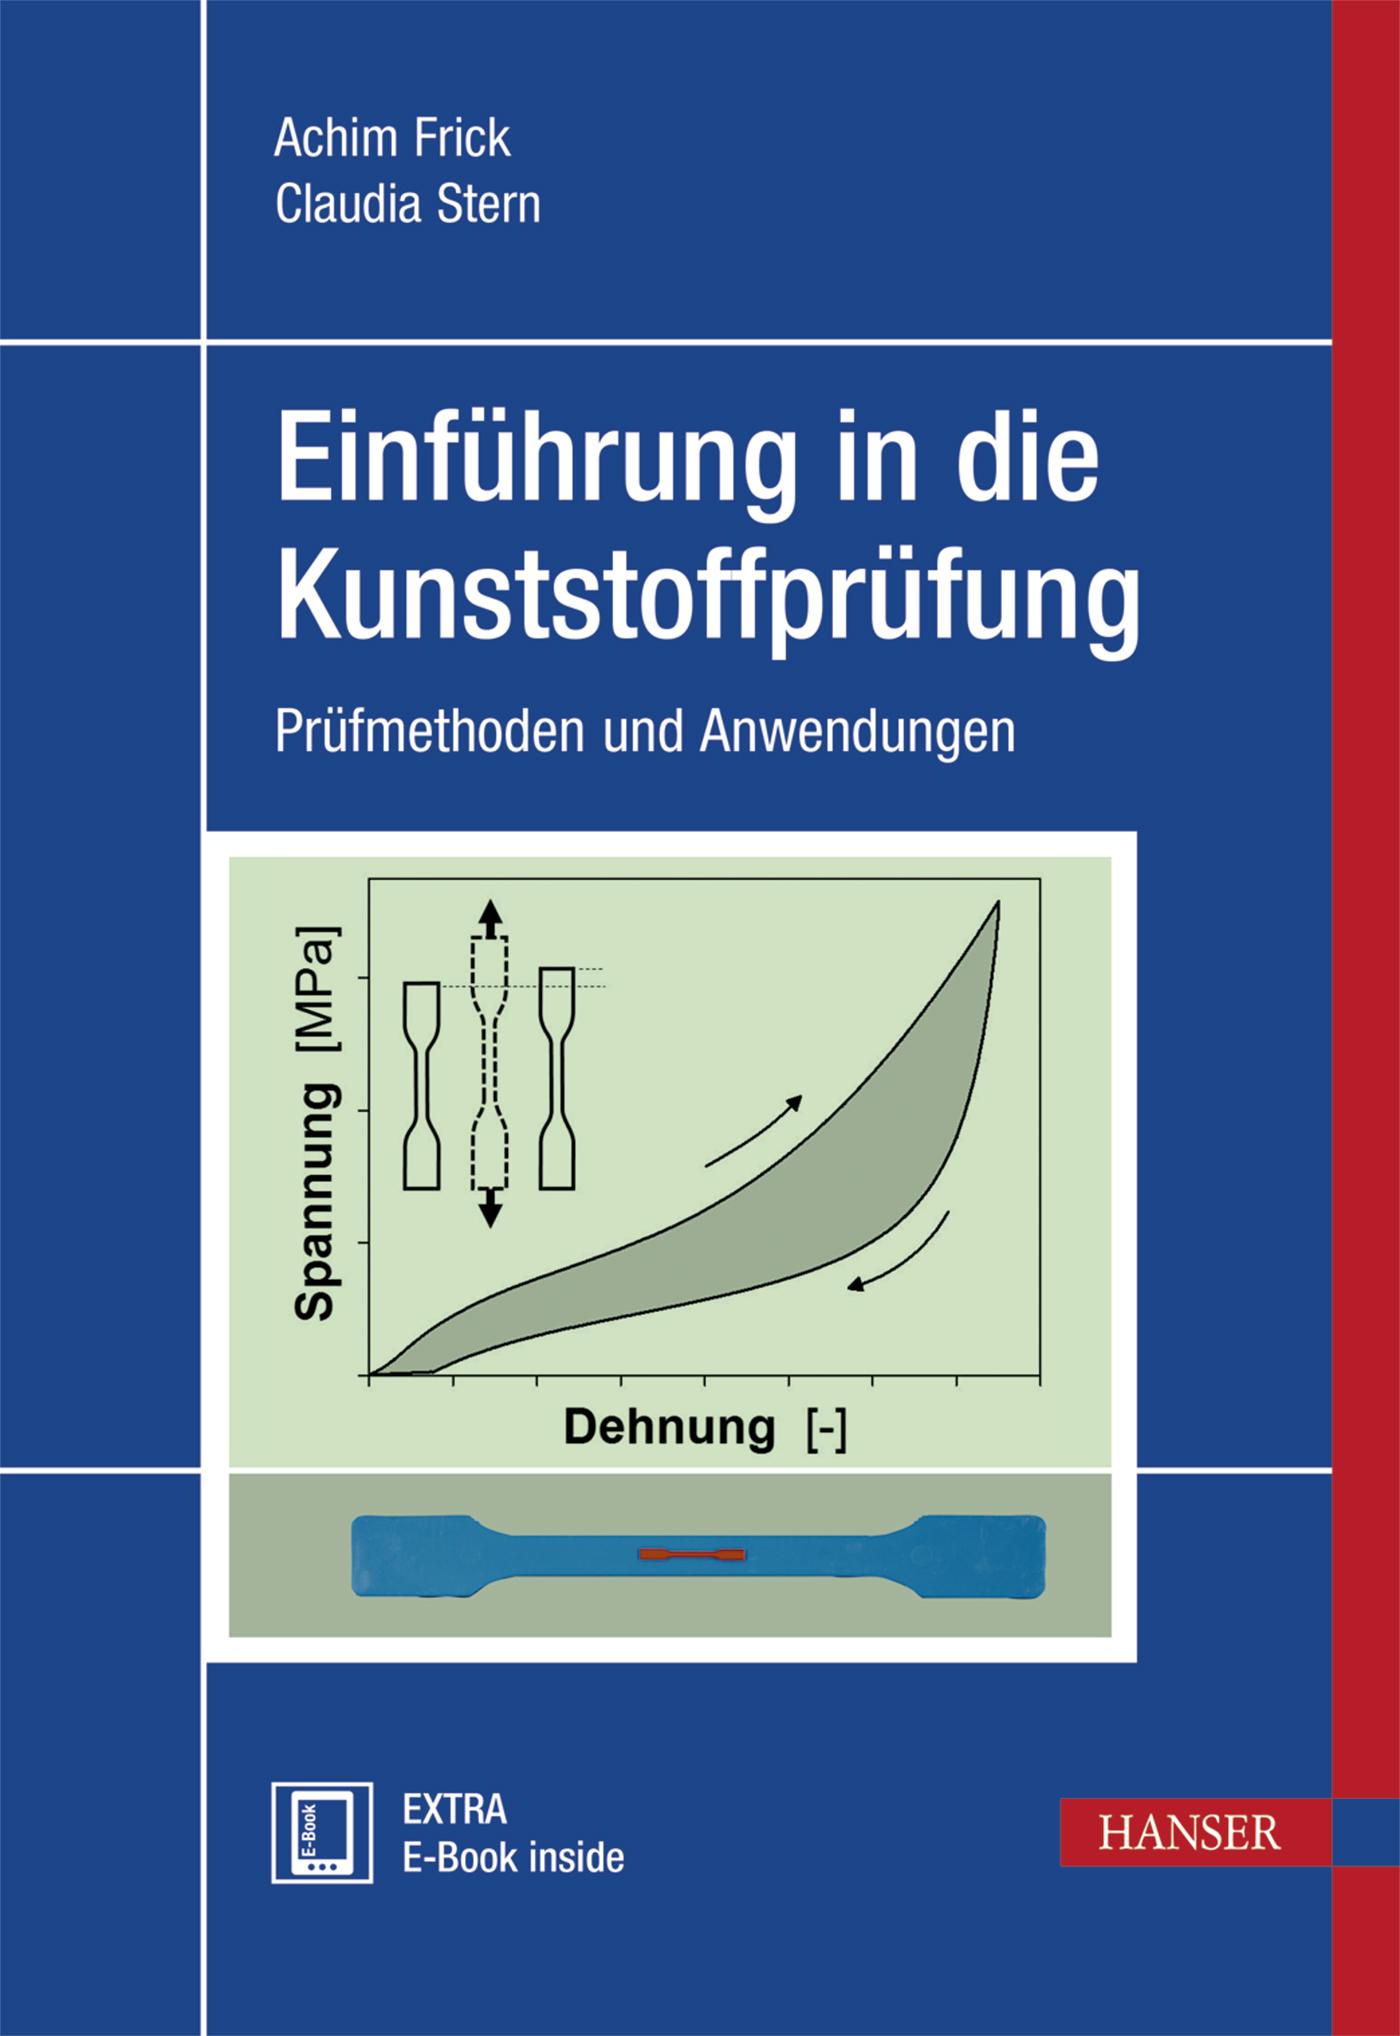 Frick, Stern, Einführung in die Kunststoffprüfung, 978-3-446-44351-8